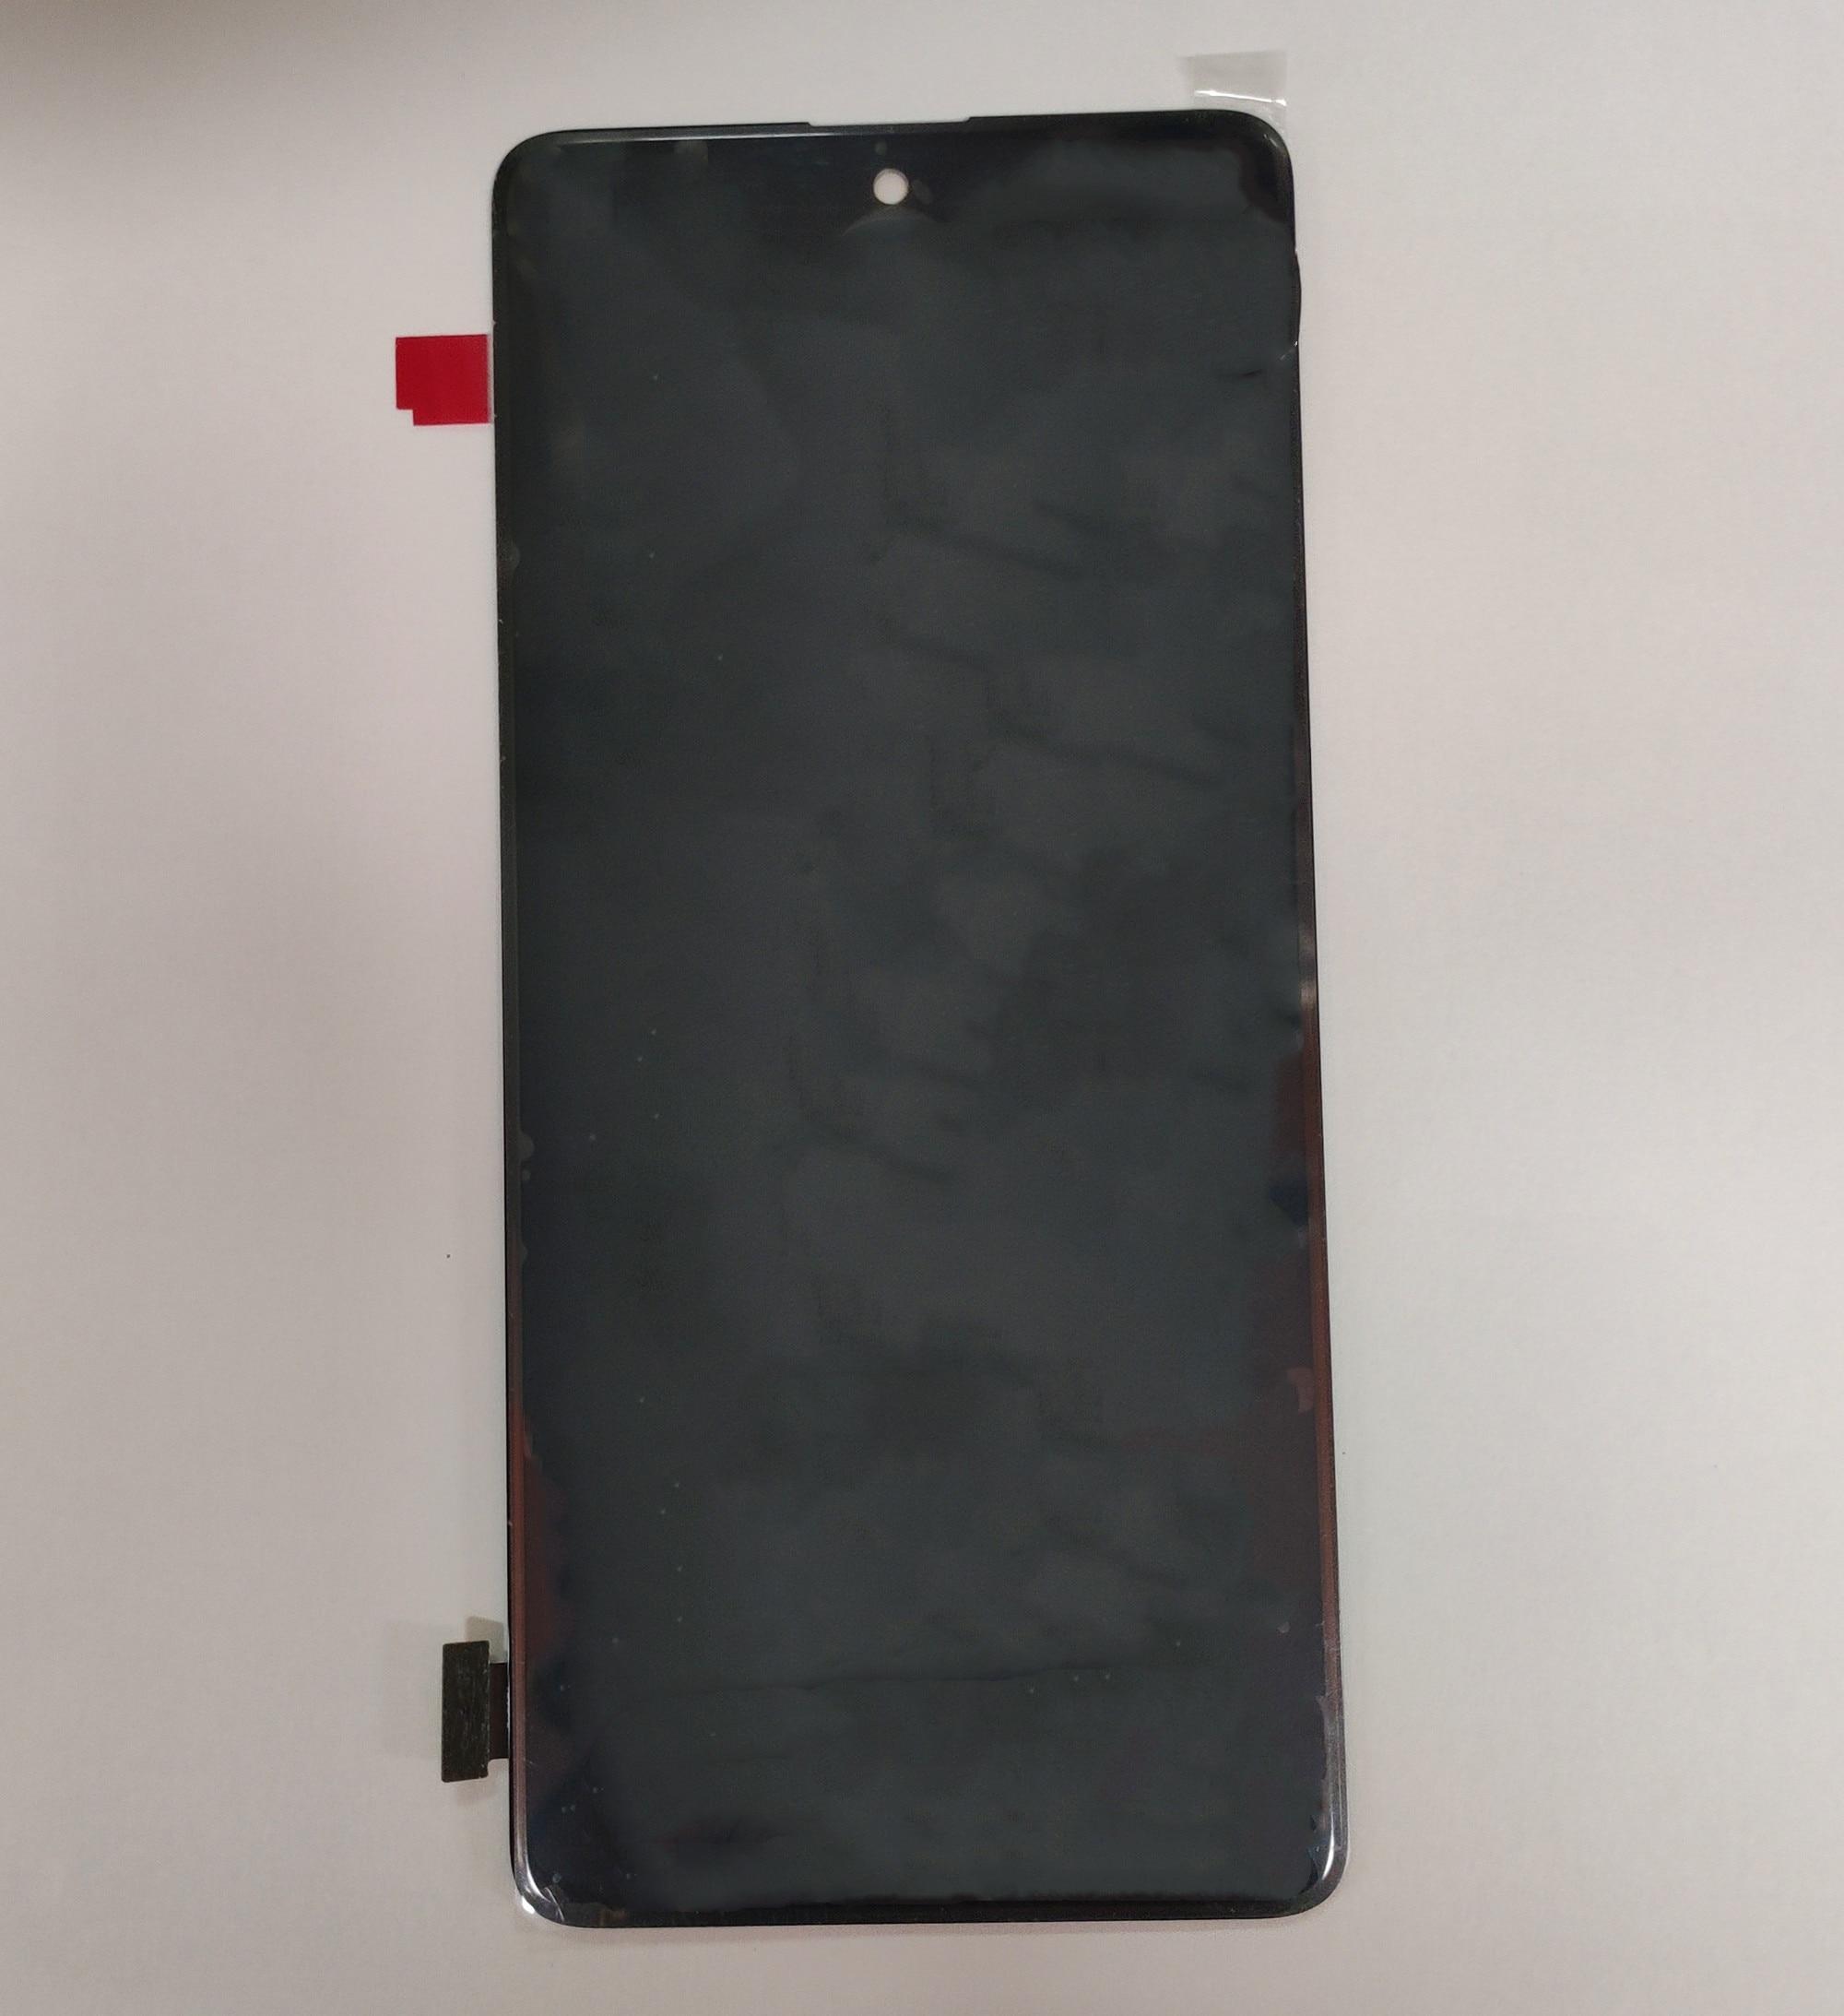 Супер AMOLED для Samsung A516 5G ЖК-дисплей A51 5G ЖК-дисплей для Samsung A51 5G ЖК-сенсорный экран дигитайзер сборка Замена